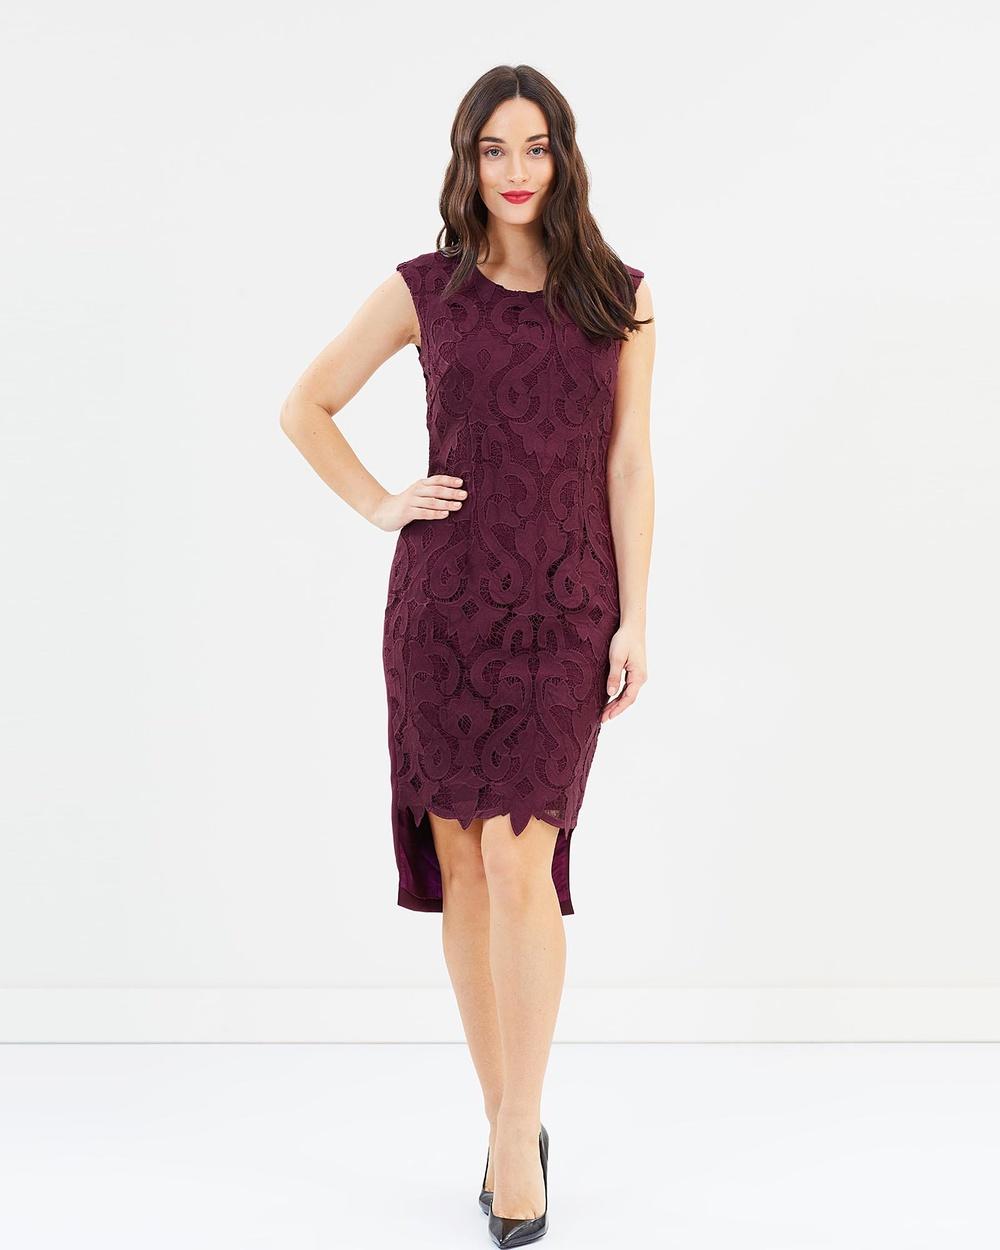 Pink Ruby Amalia Step Back Dress Dresses Burgundy Amalia Step Back Dress